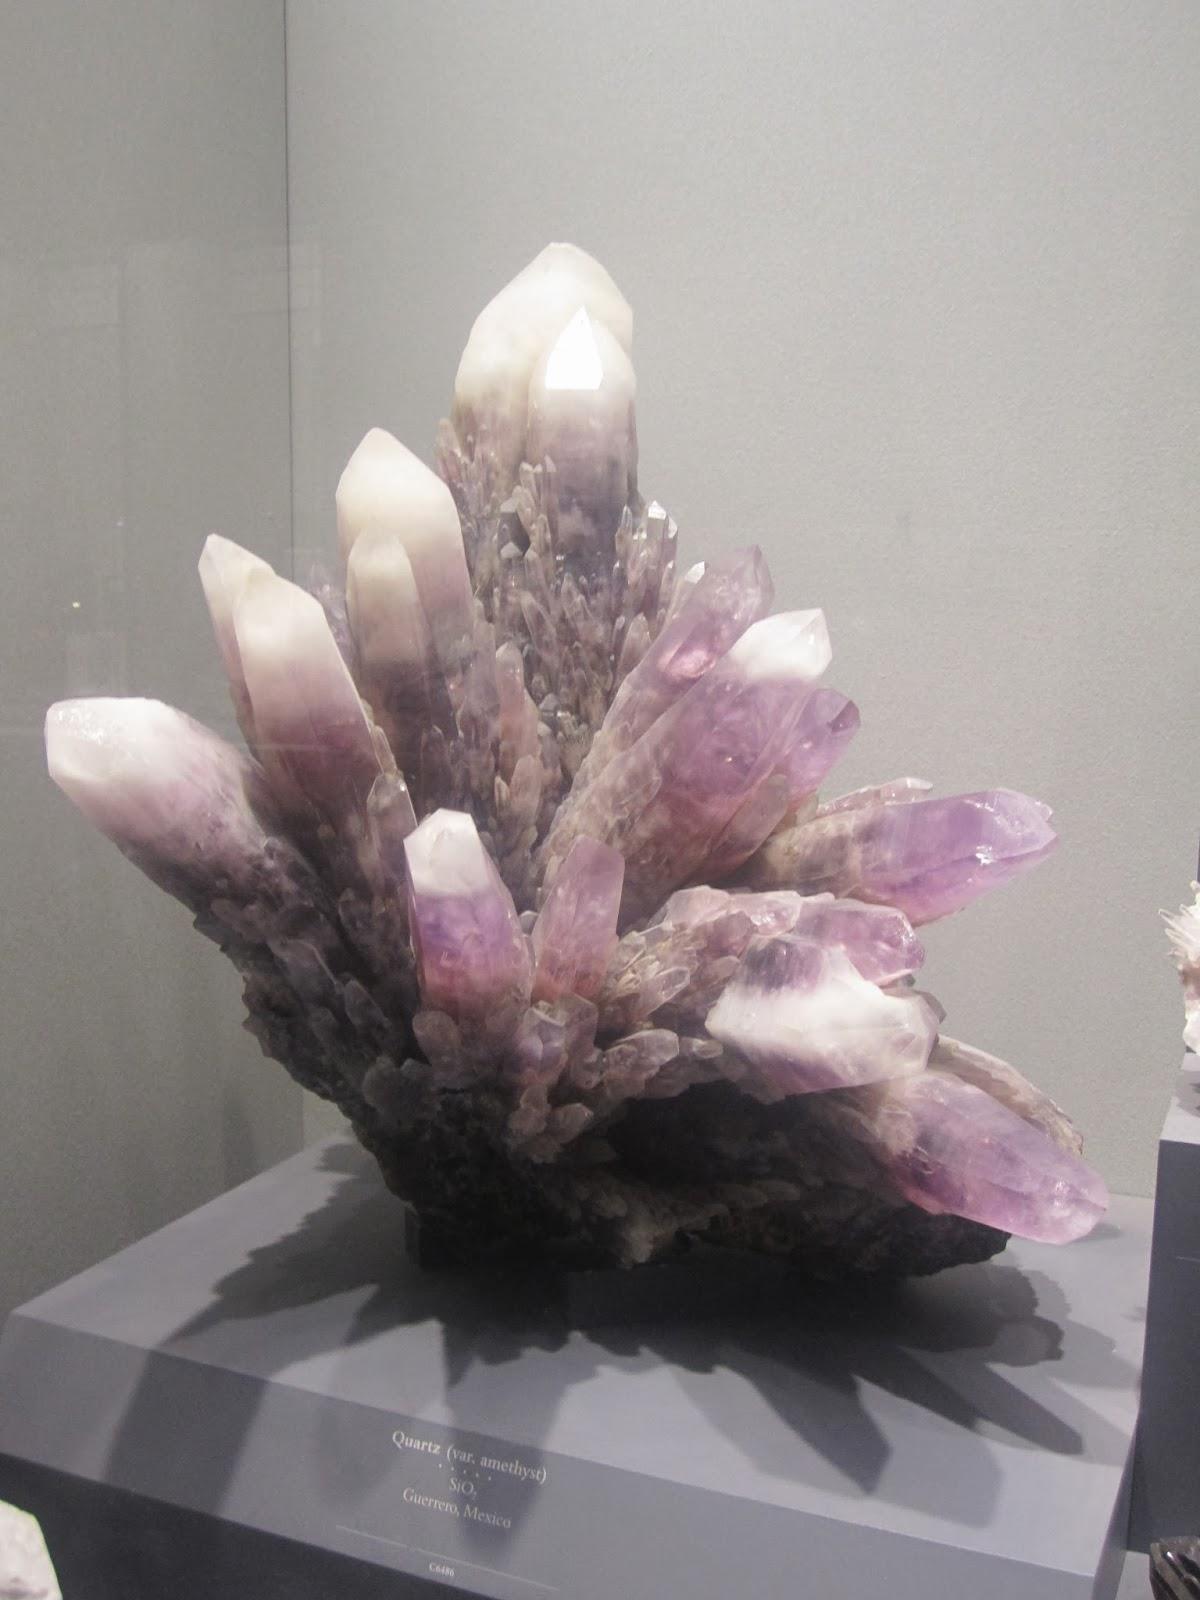 DC natural histroy museum, gem stones